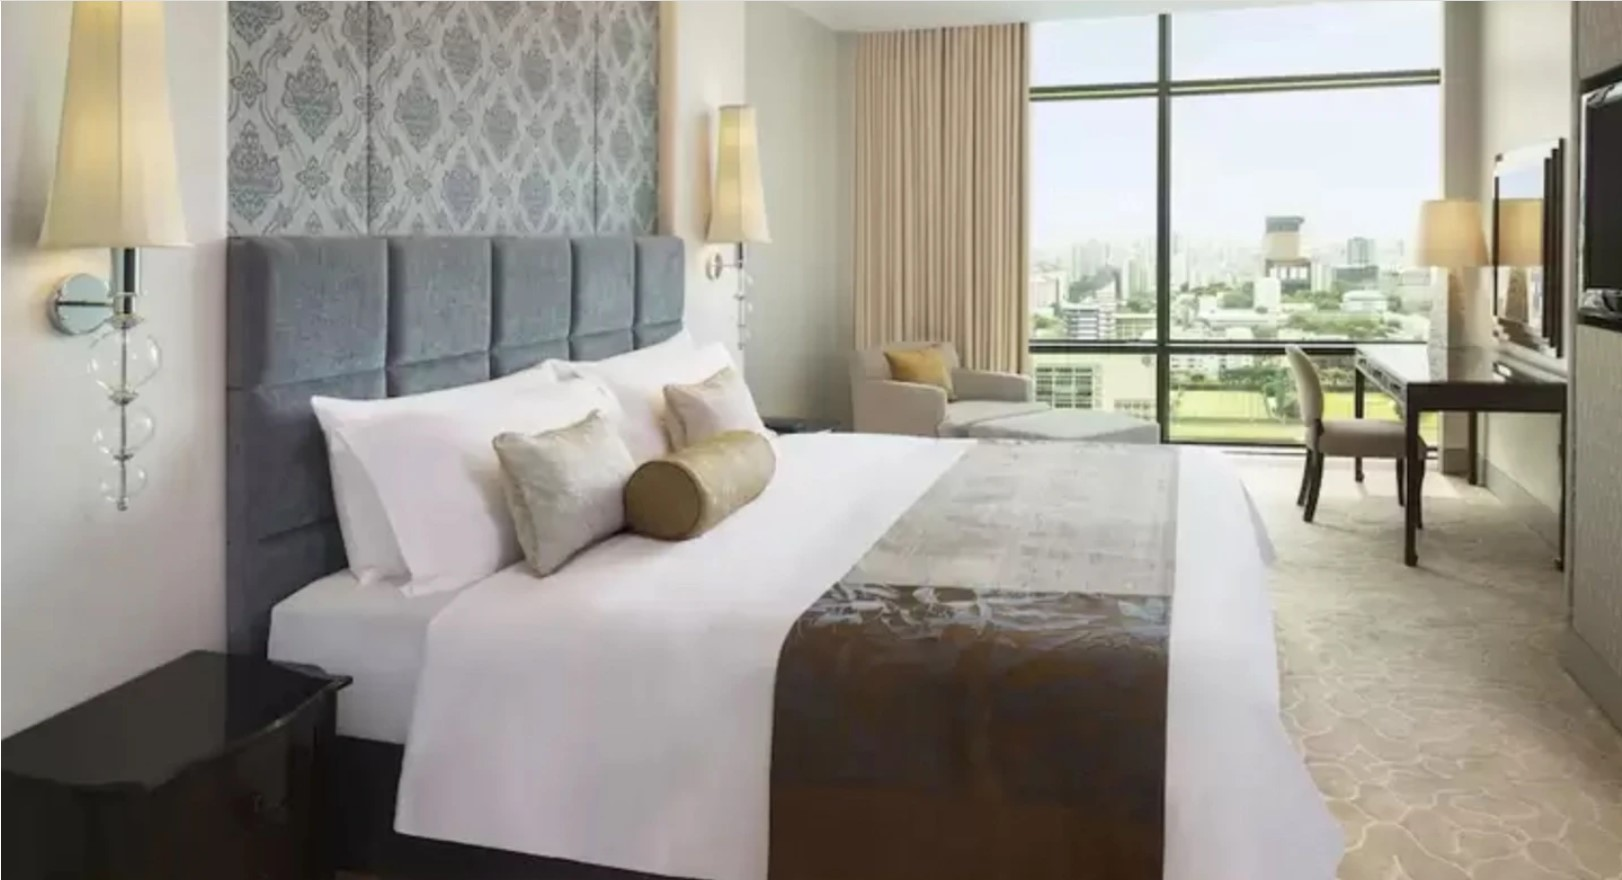 מלון סנט רג'יס בנגקוק